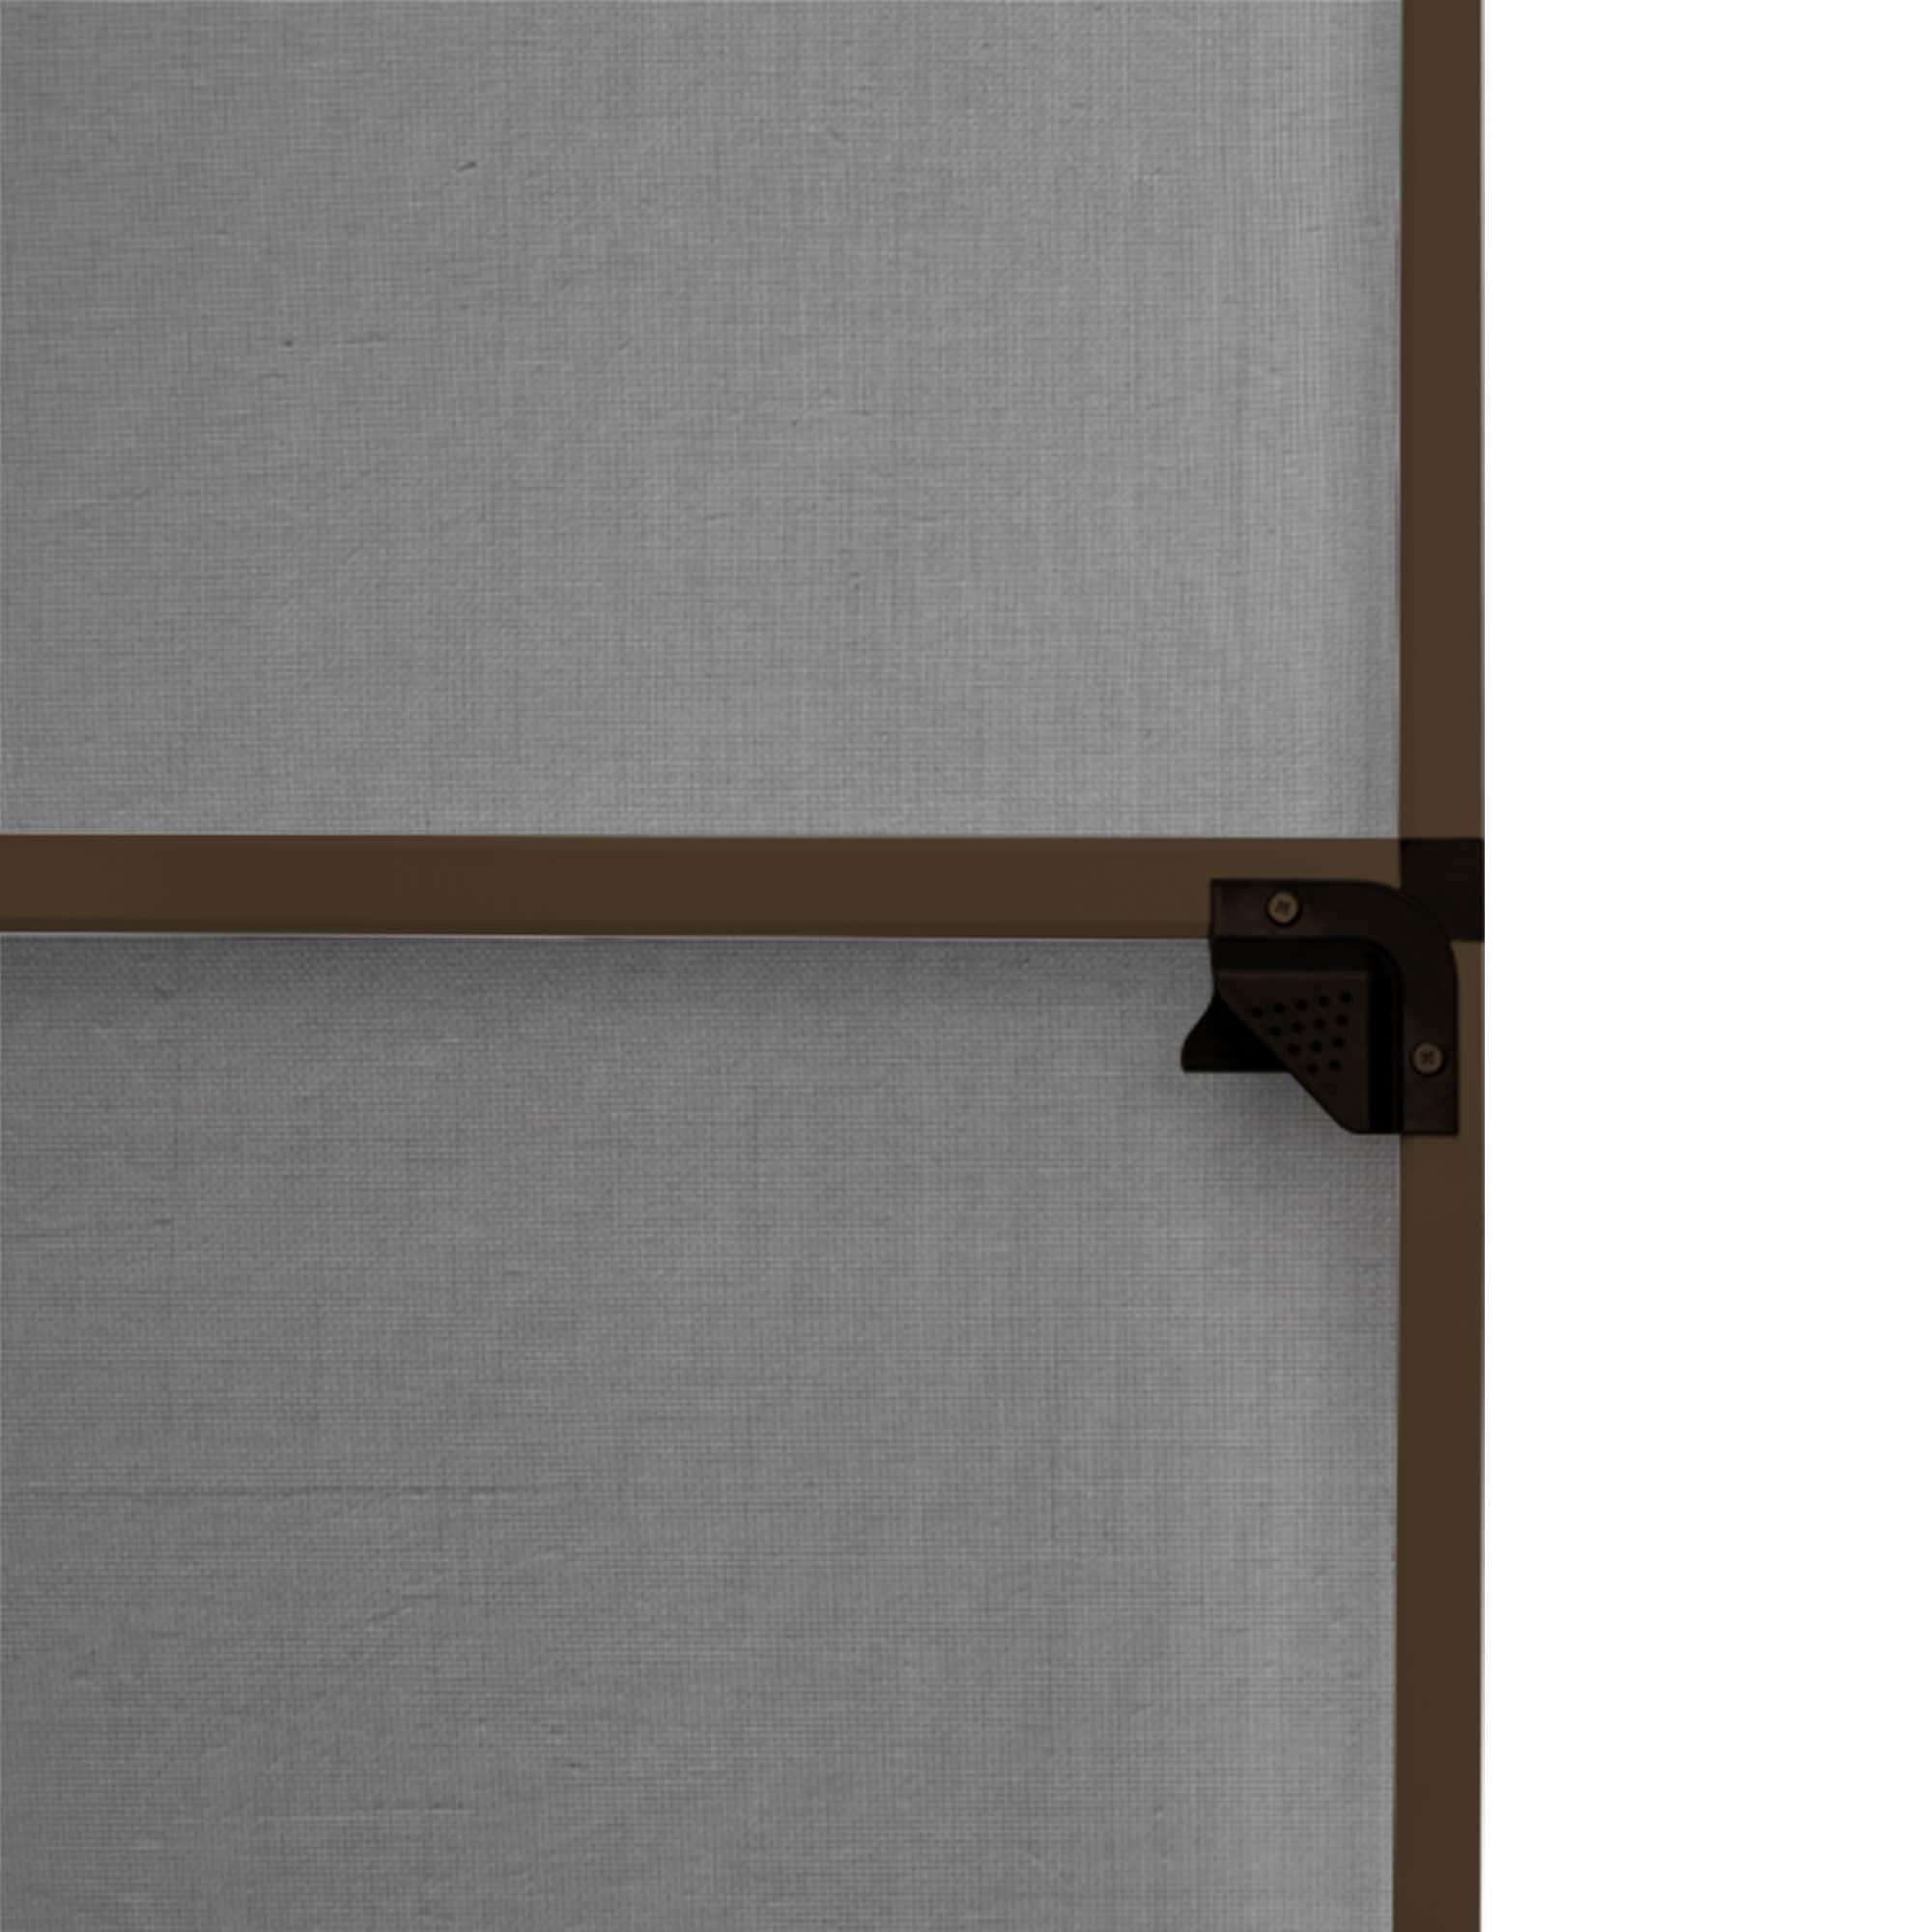 Fliegengitter-Tuerrahmen-Insektenschutz-Tuer-Drehrahmen-Rahmen-Tuergitter-120x220cm Indexbild 8